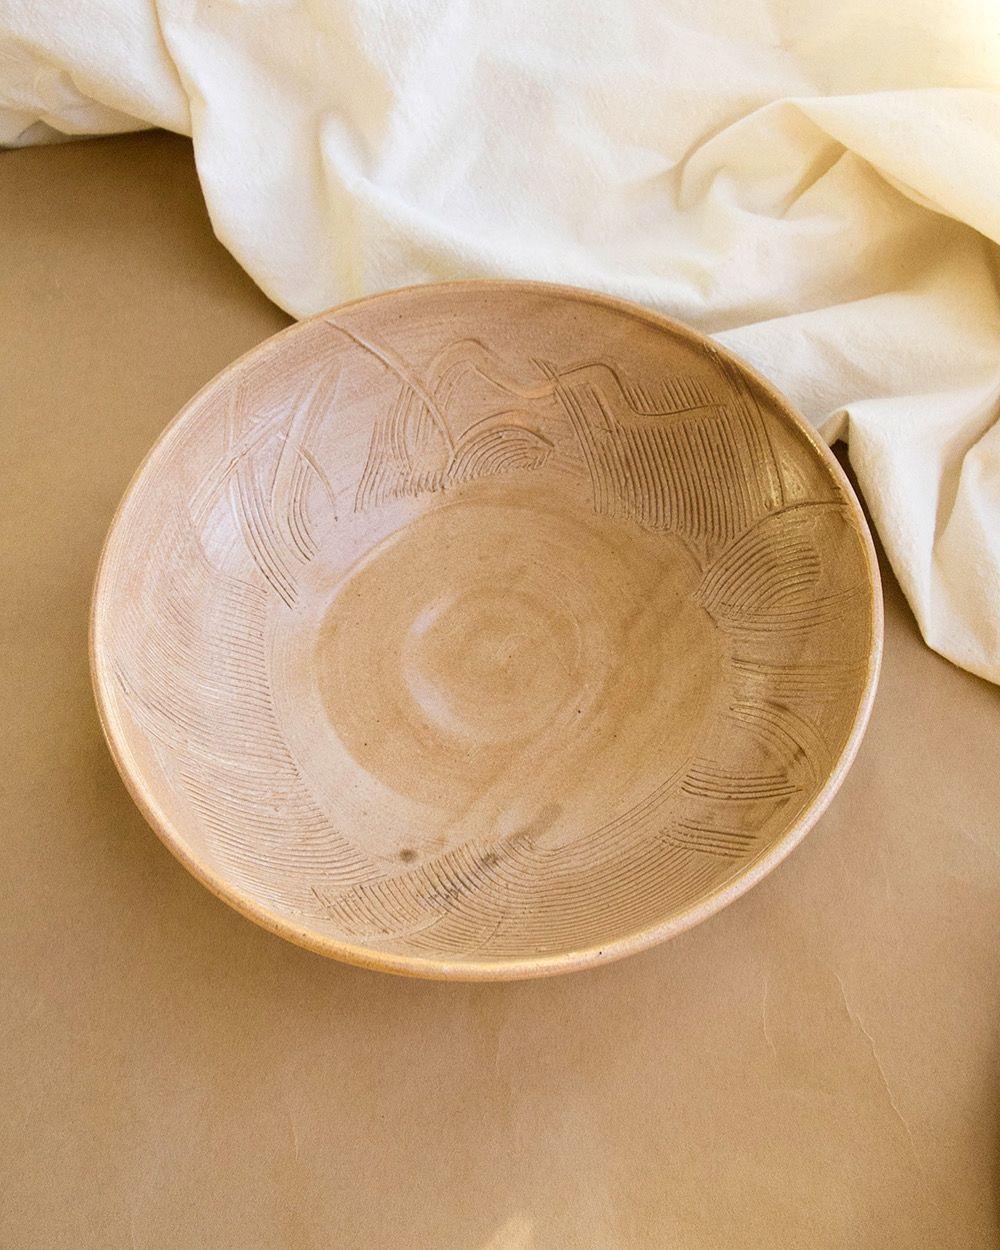 #wheelthrown #handmadepottery #contemporaryceramics #pastabowl #tableware